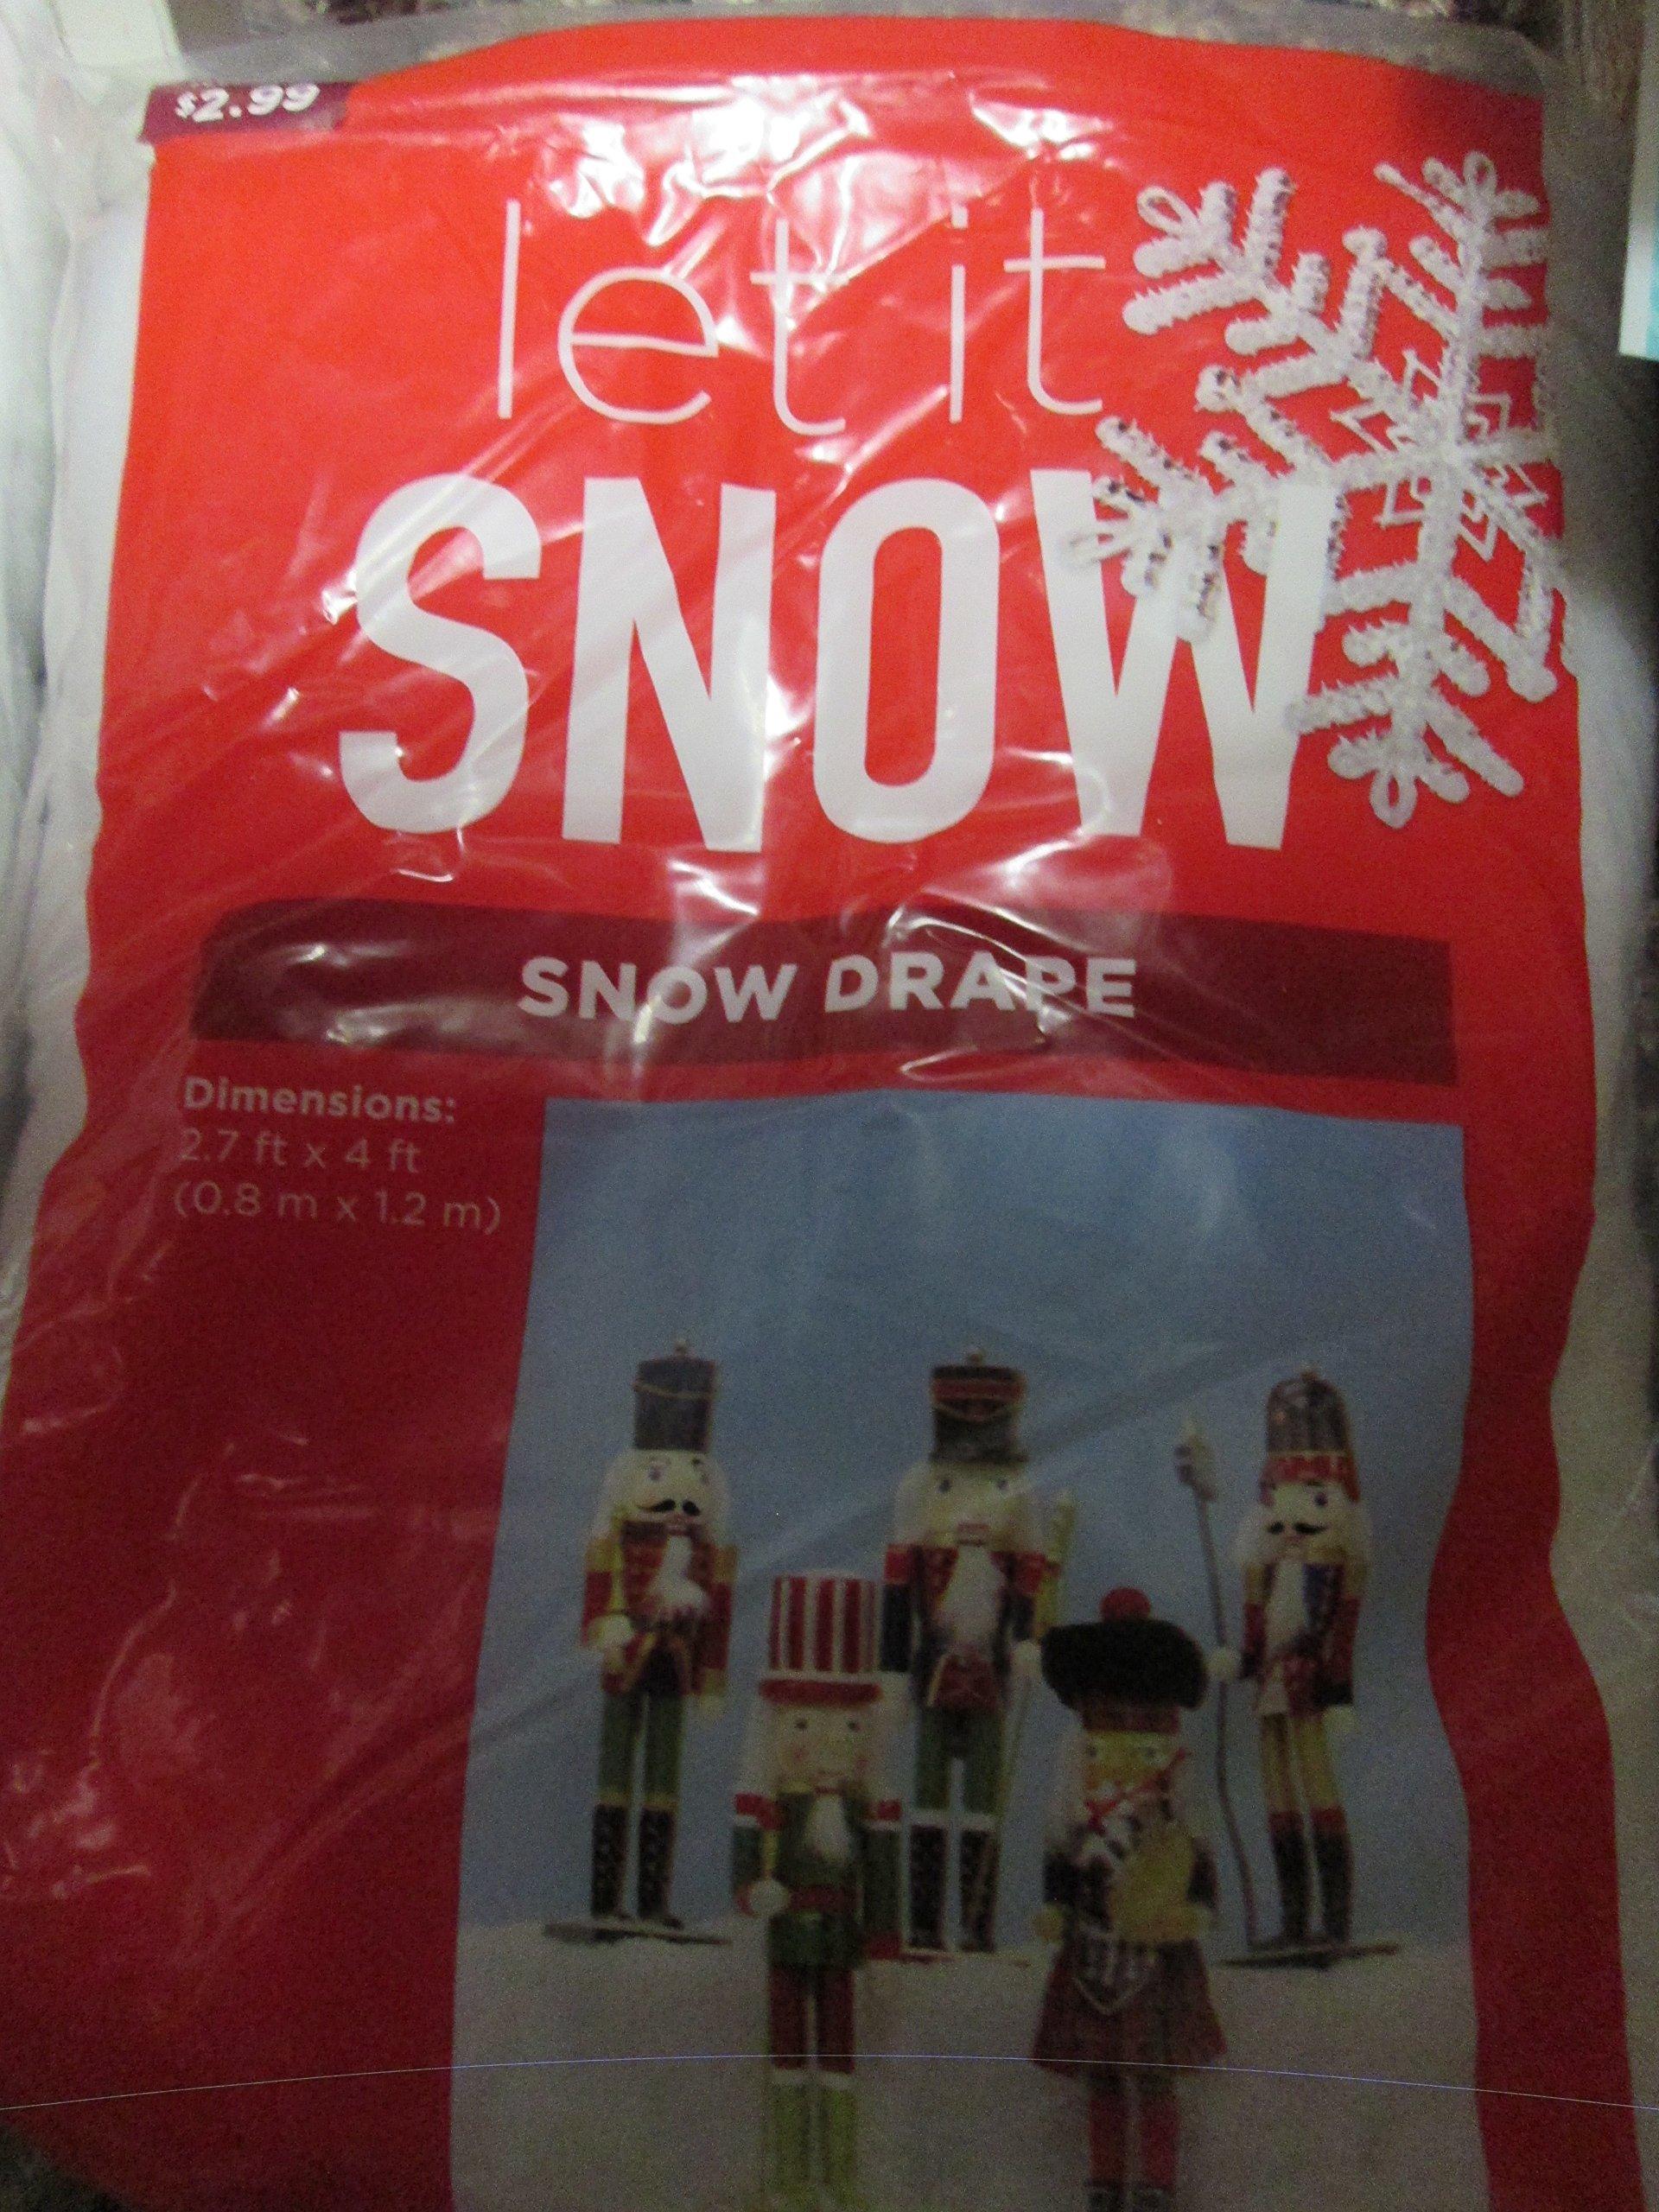 Snow Drape for under tree or village scene